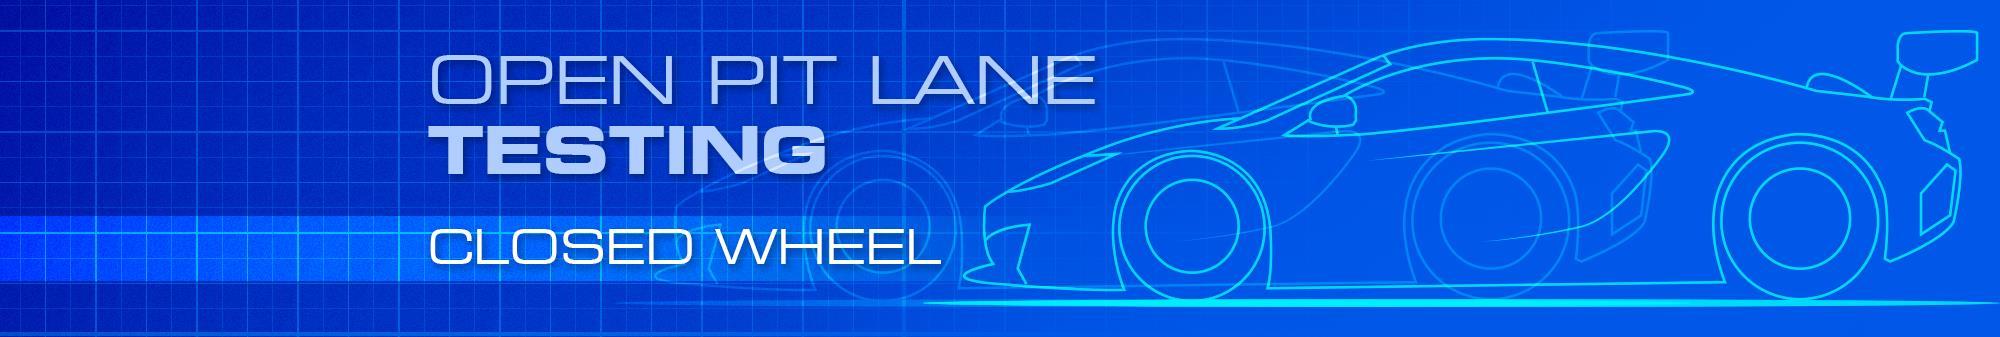 Open Pit Lane Testing - £155